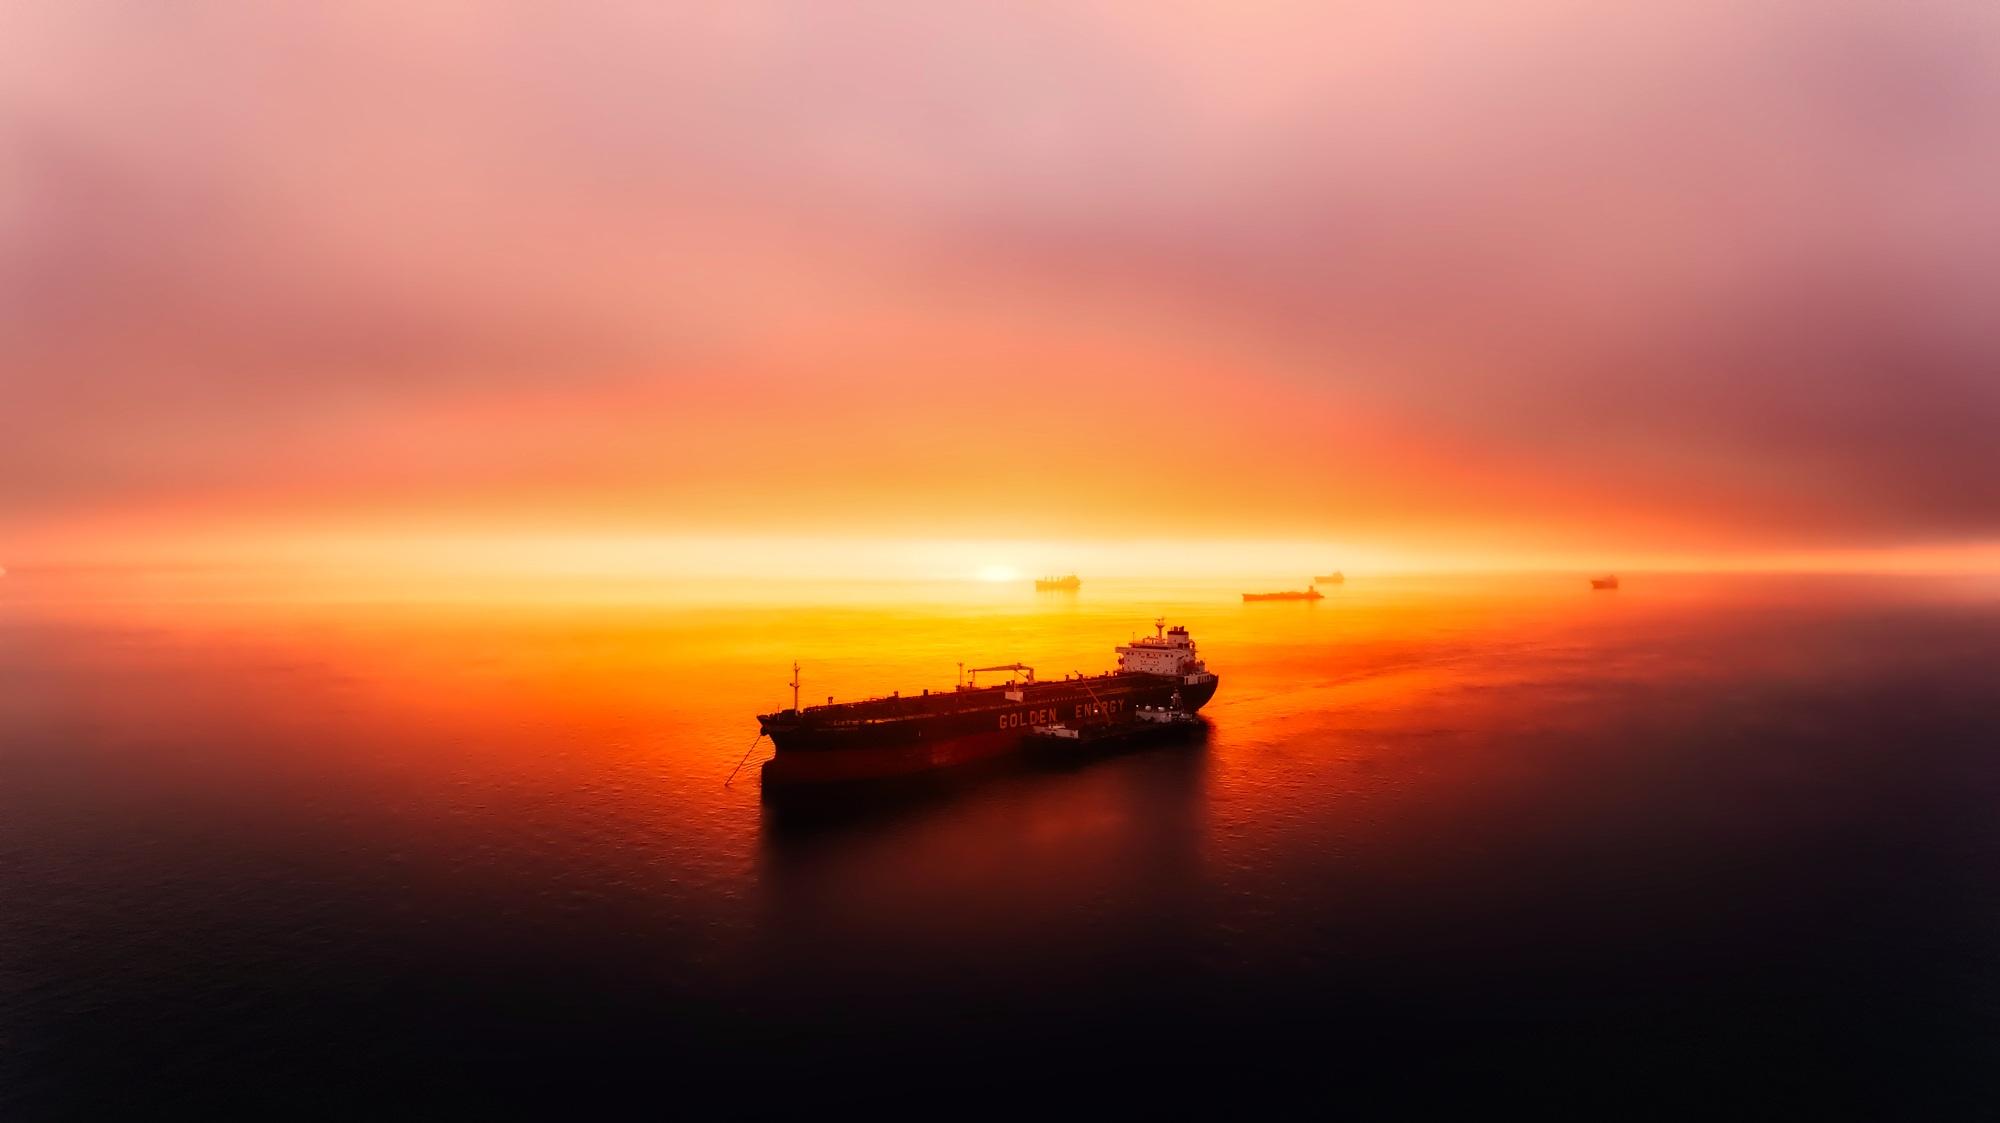 sunset-2372384.jpg